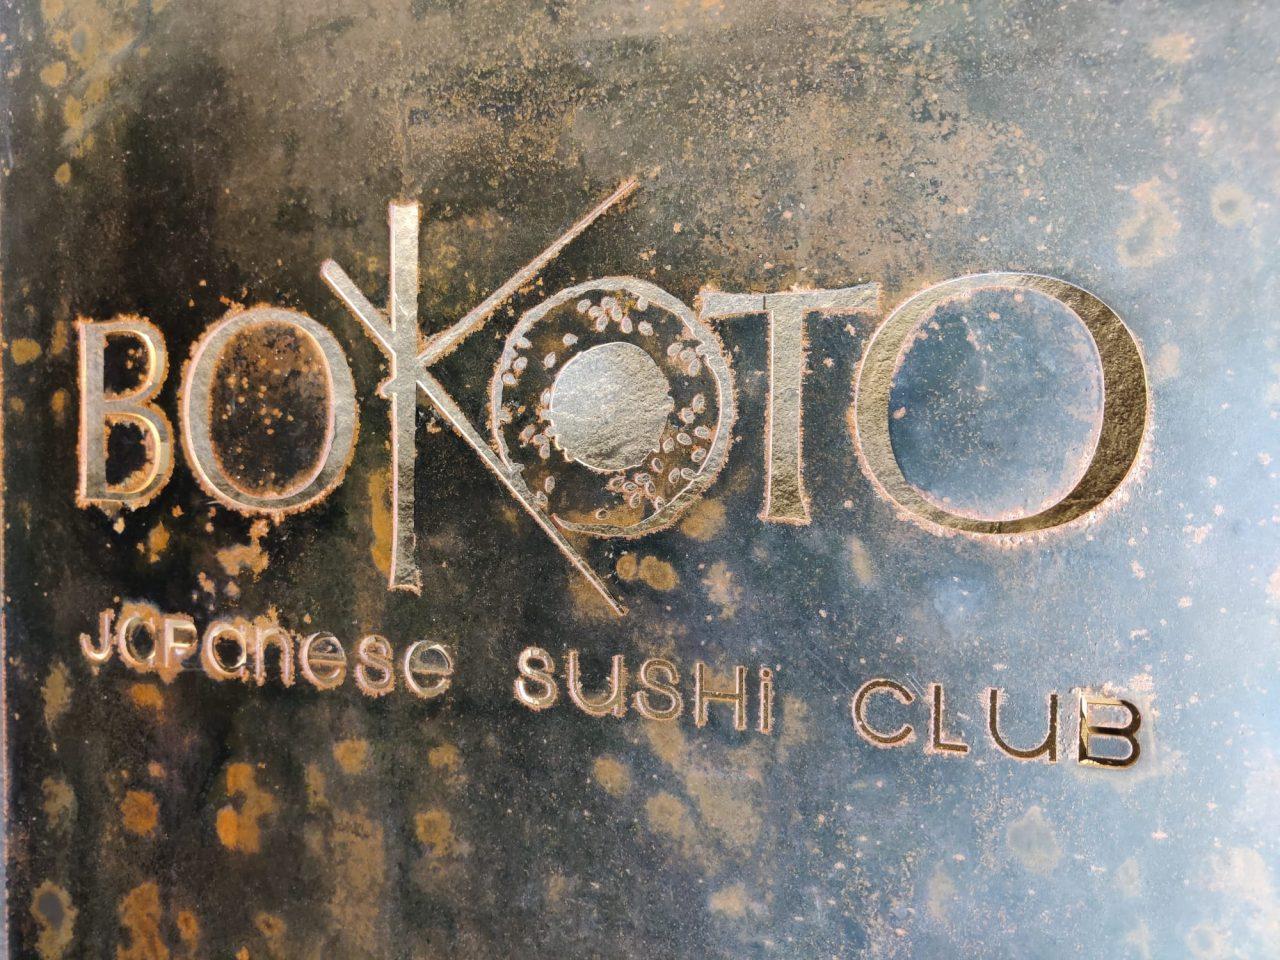 Bokoto-restaurant-japonès-1280x960.jpg